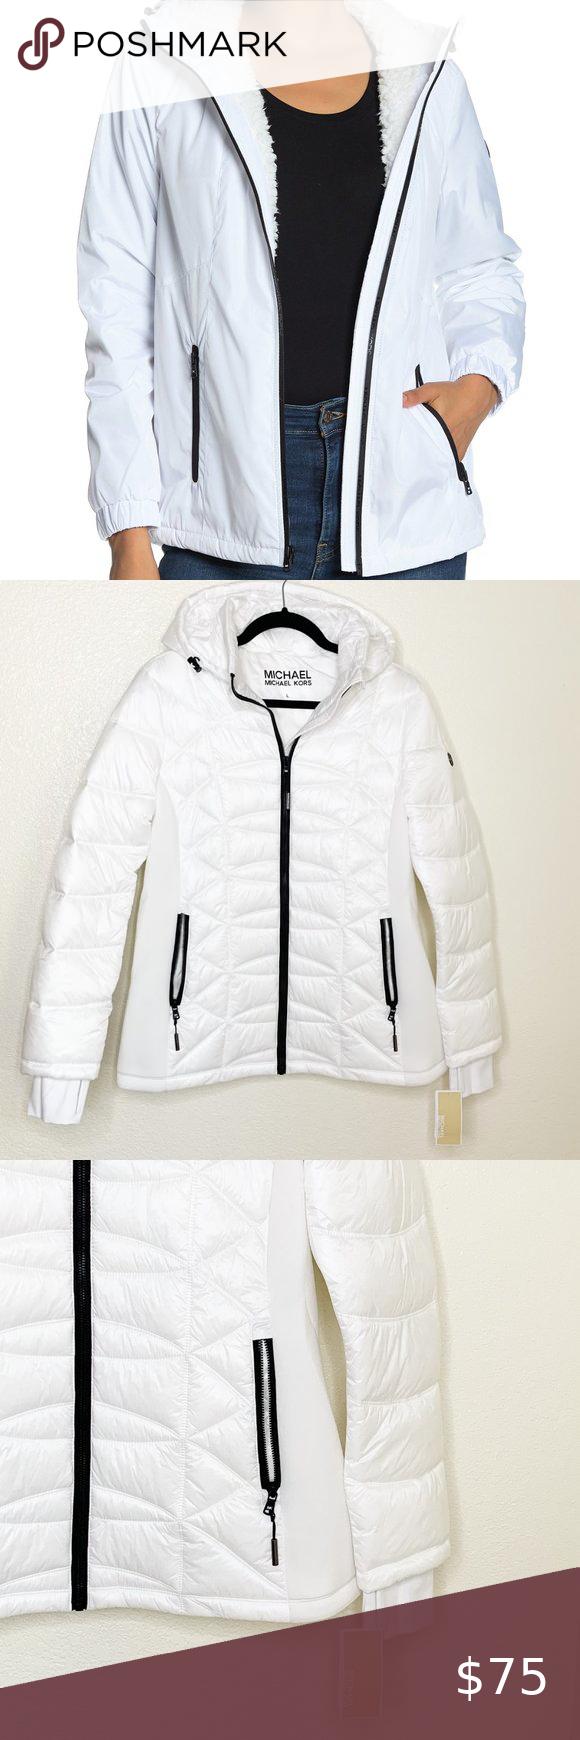 Hold Micahel Kors White Missy Puffer Jacket Line Jackets Long Hooded Coat Black Puffer Coat [ 1740 x 580 Pixel ]